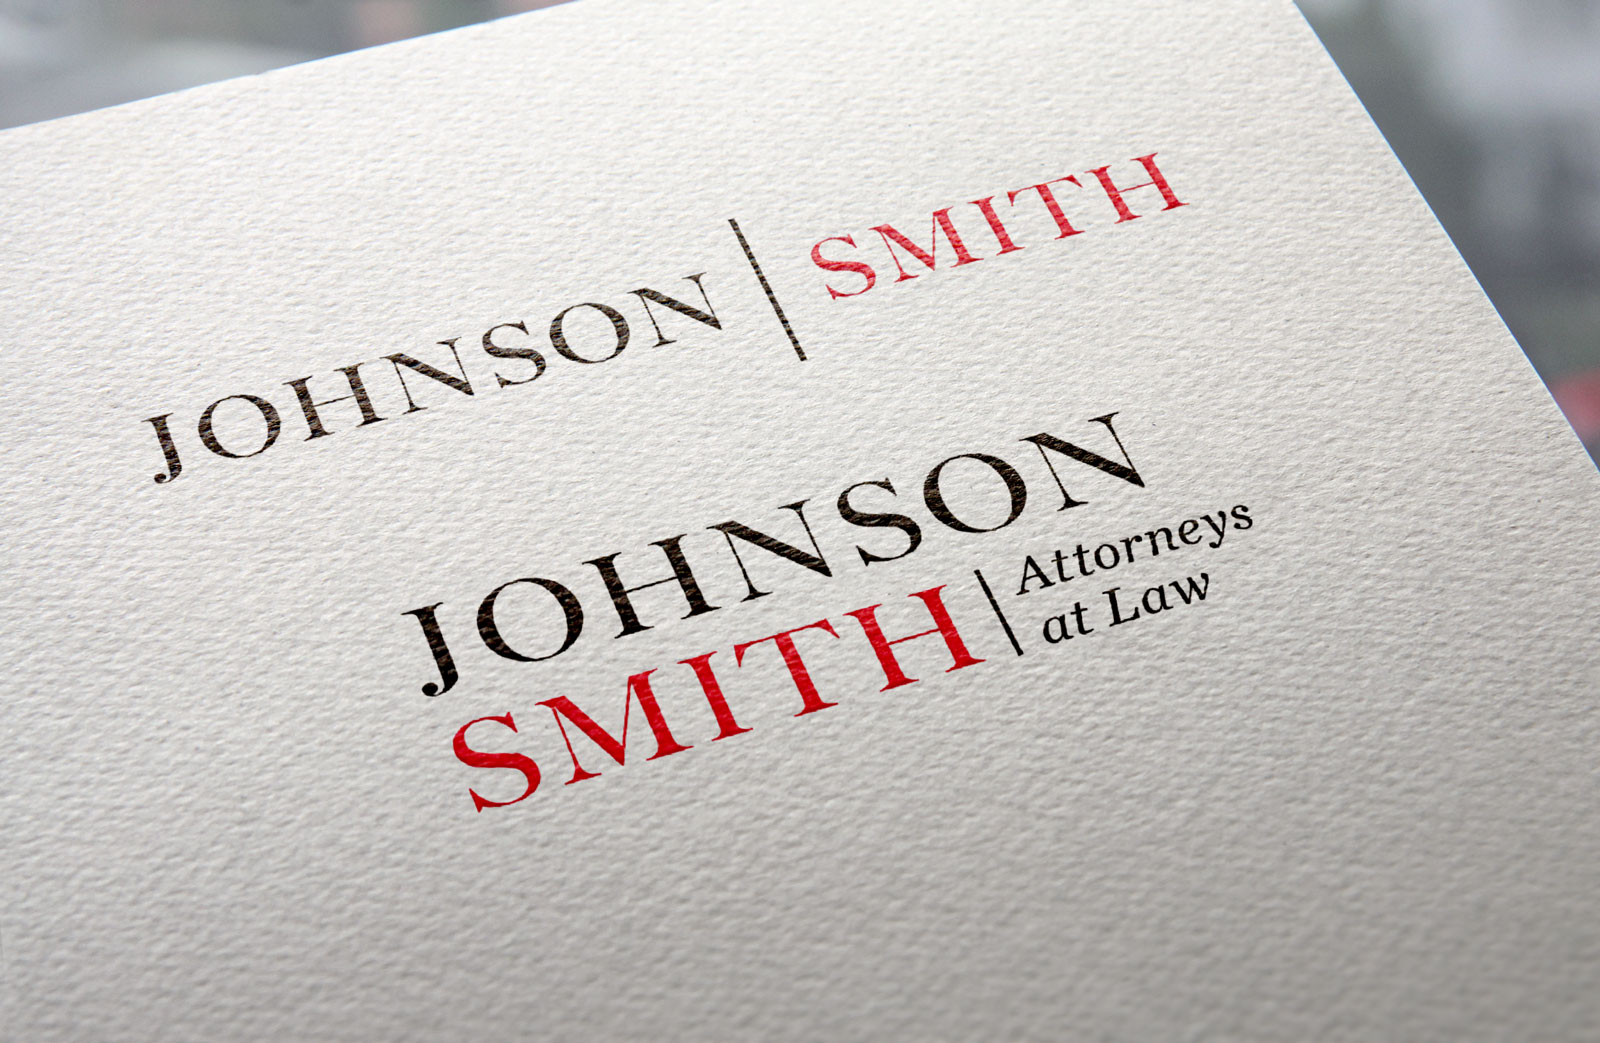 Johnson / Smith lawfirm logo